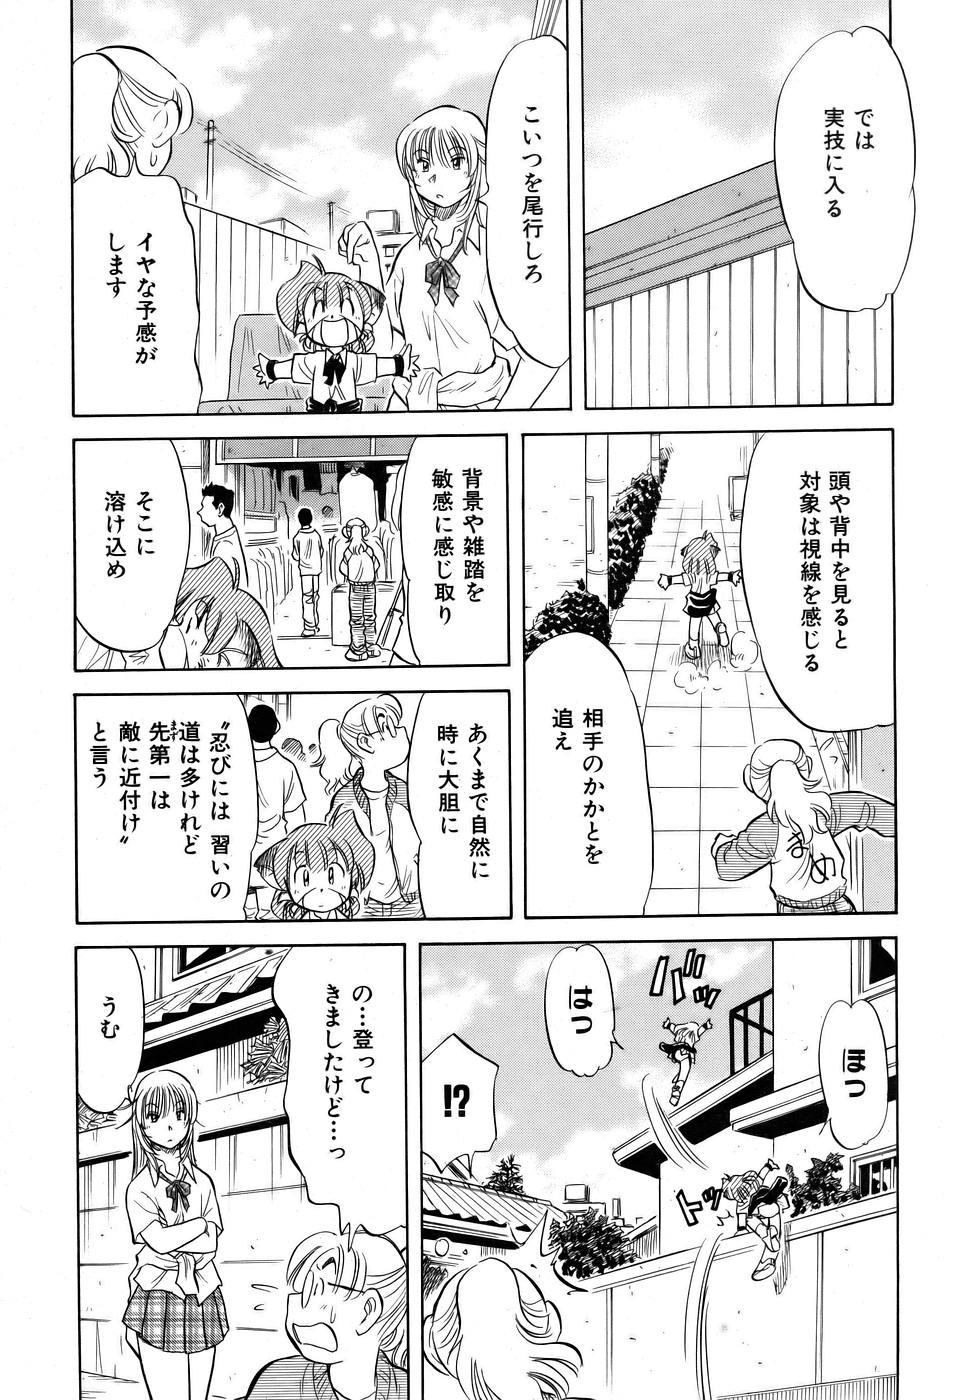 COMIC AUN 2005-12 Vol. 115 192